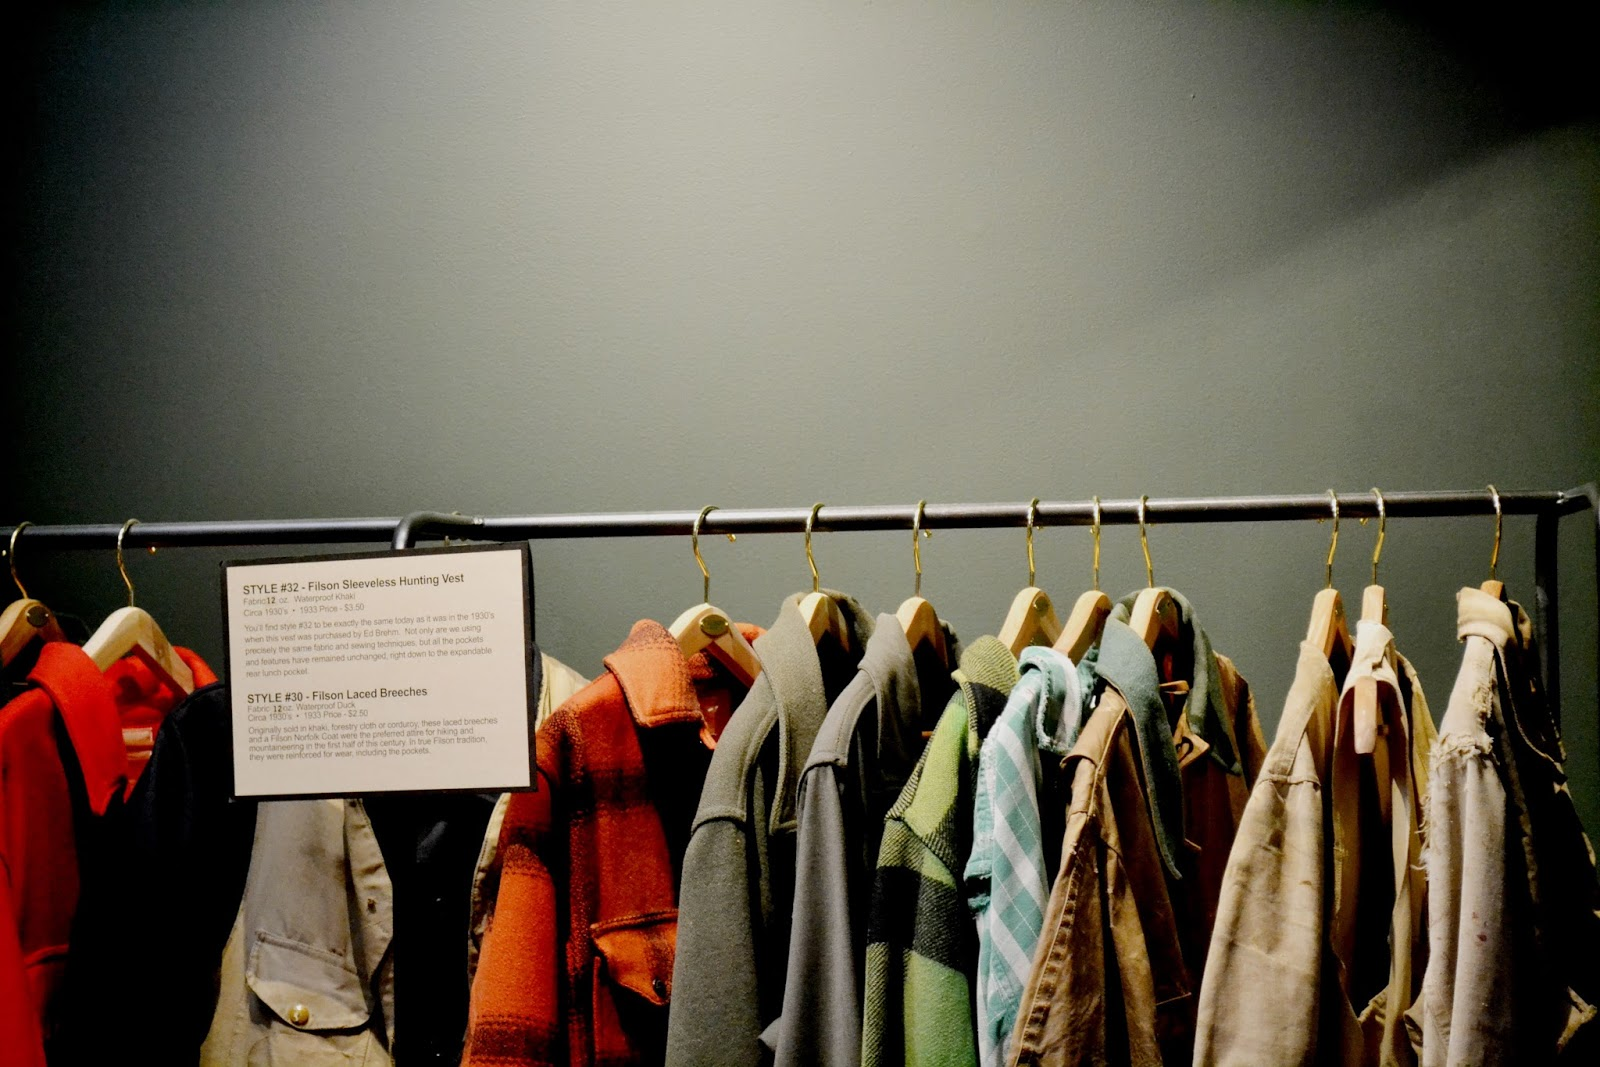 vintage, filson, coats, seattle, heritage brand